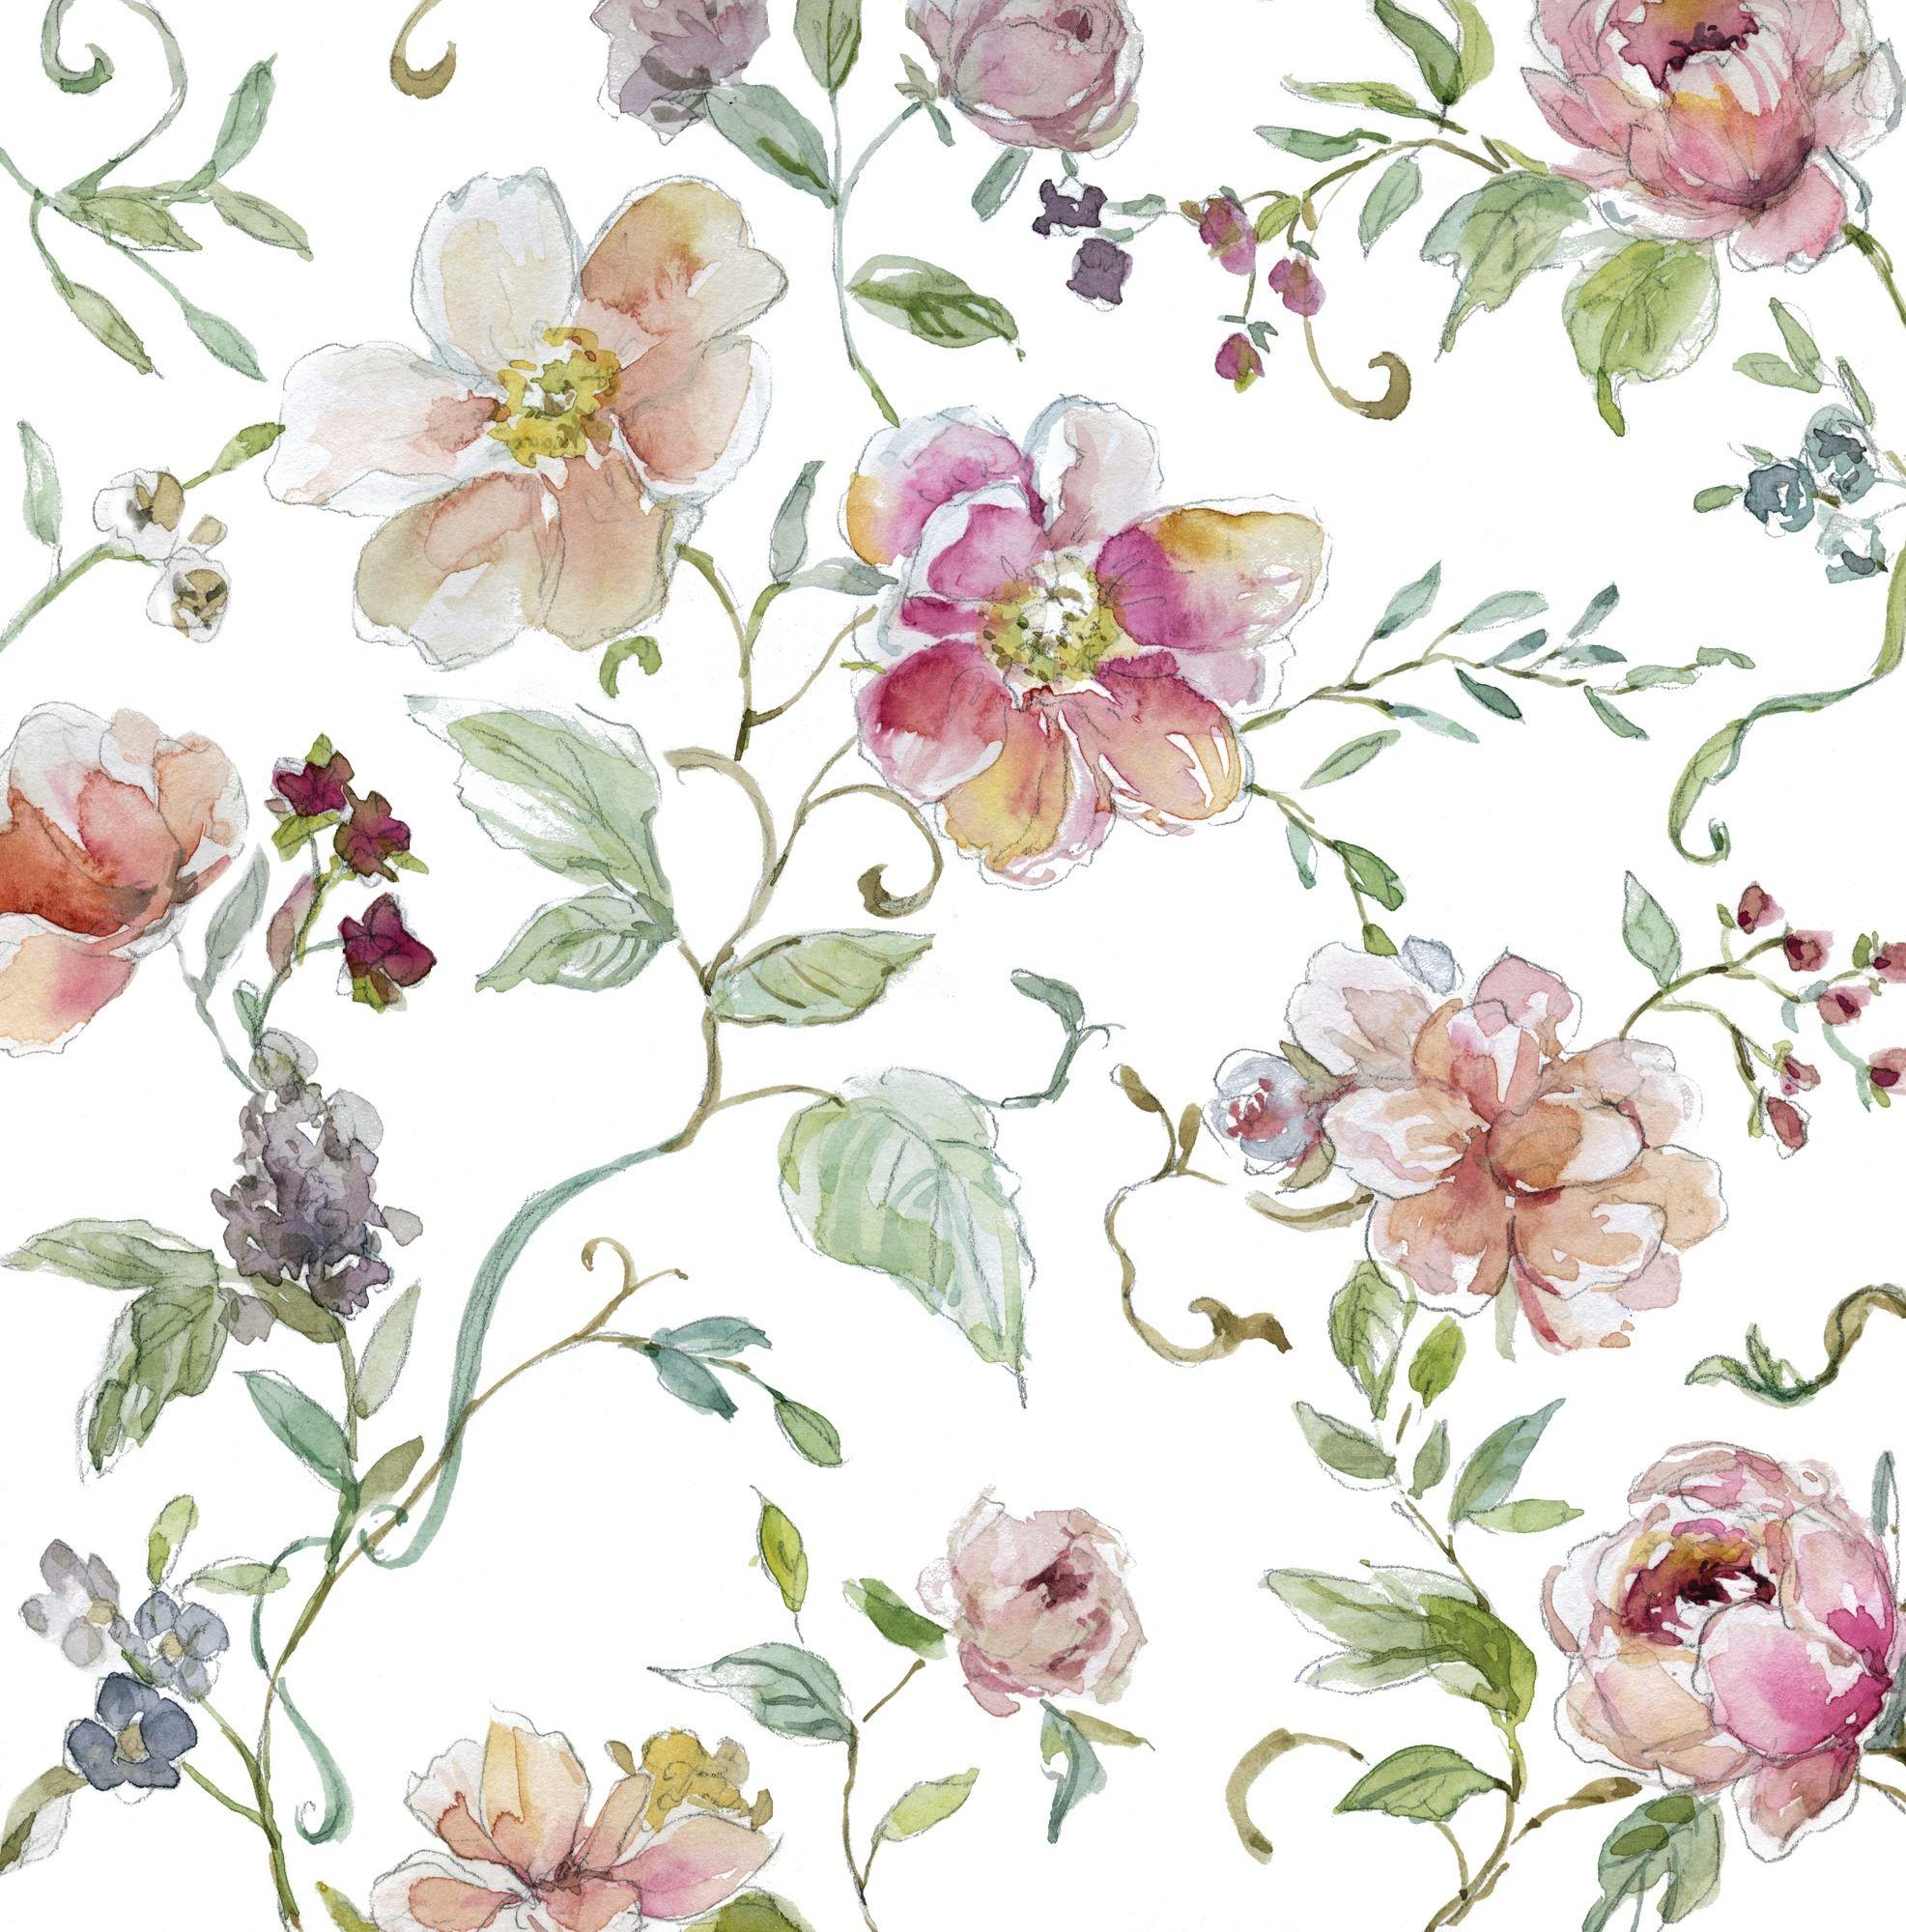 Chinoiserie Wallpaper Wallsauce Us Chinoiserie Wallpaper Chinoiserie Mural Wallpaper